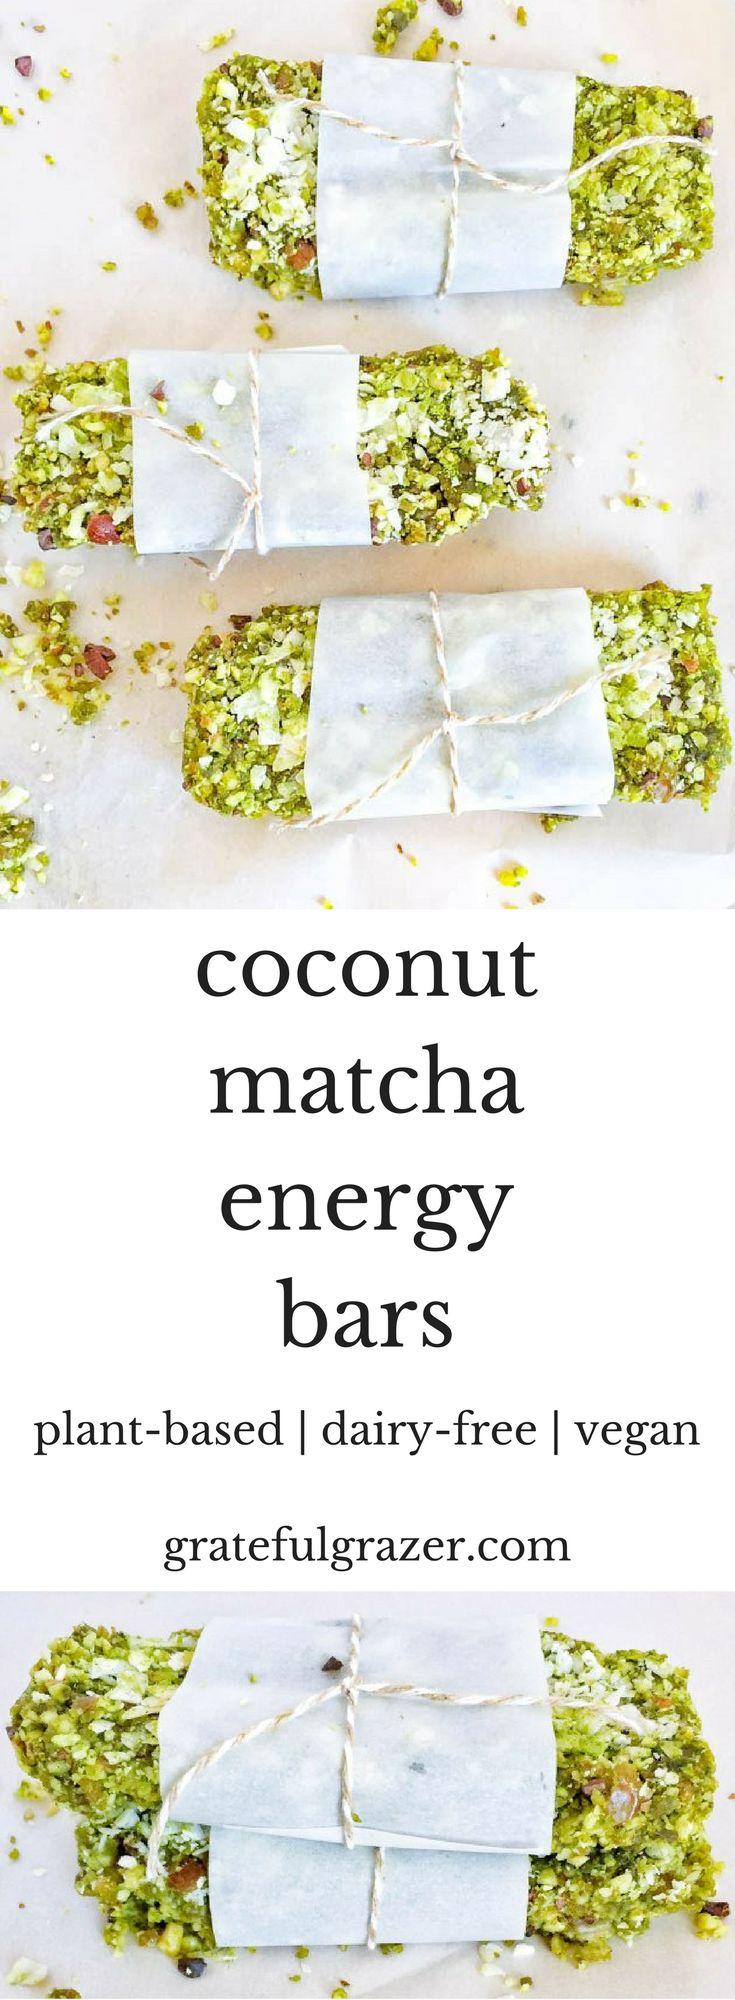 Delicious plant-based Coconut Matcha Energy Bars are the perfect energizing road trip snack!  via @gratefulgrazer